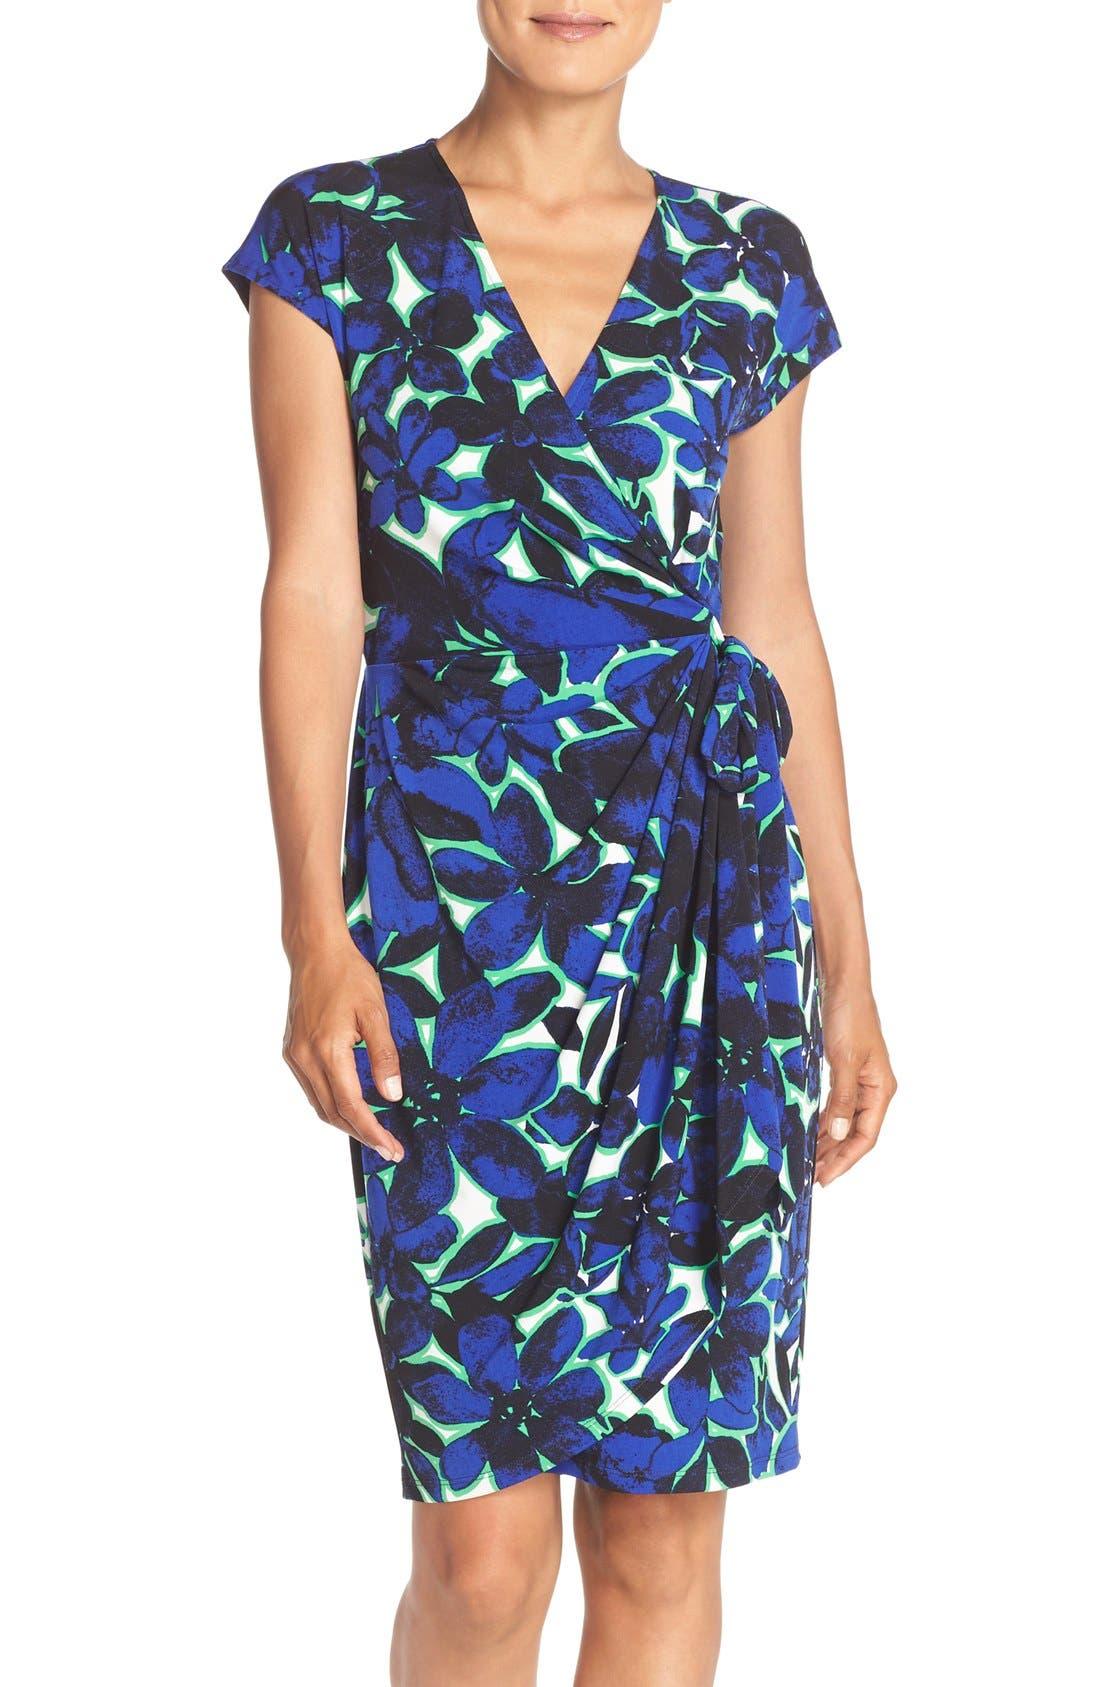 Alternate Image 1 Selected - Maggy London Print Wrap Dress (Regular & Petite)